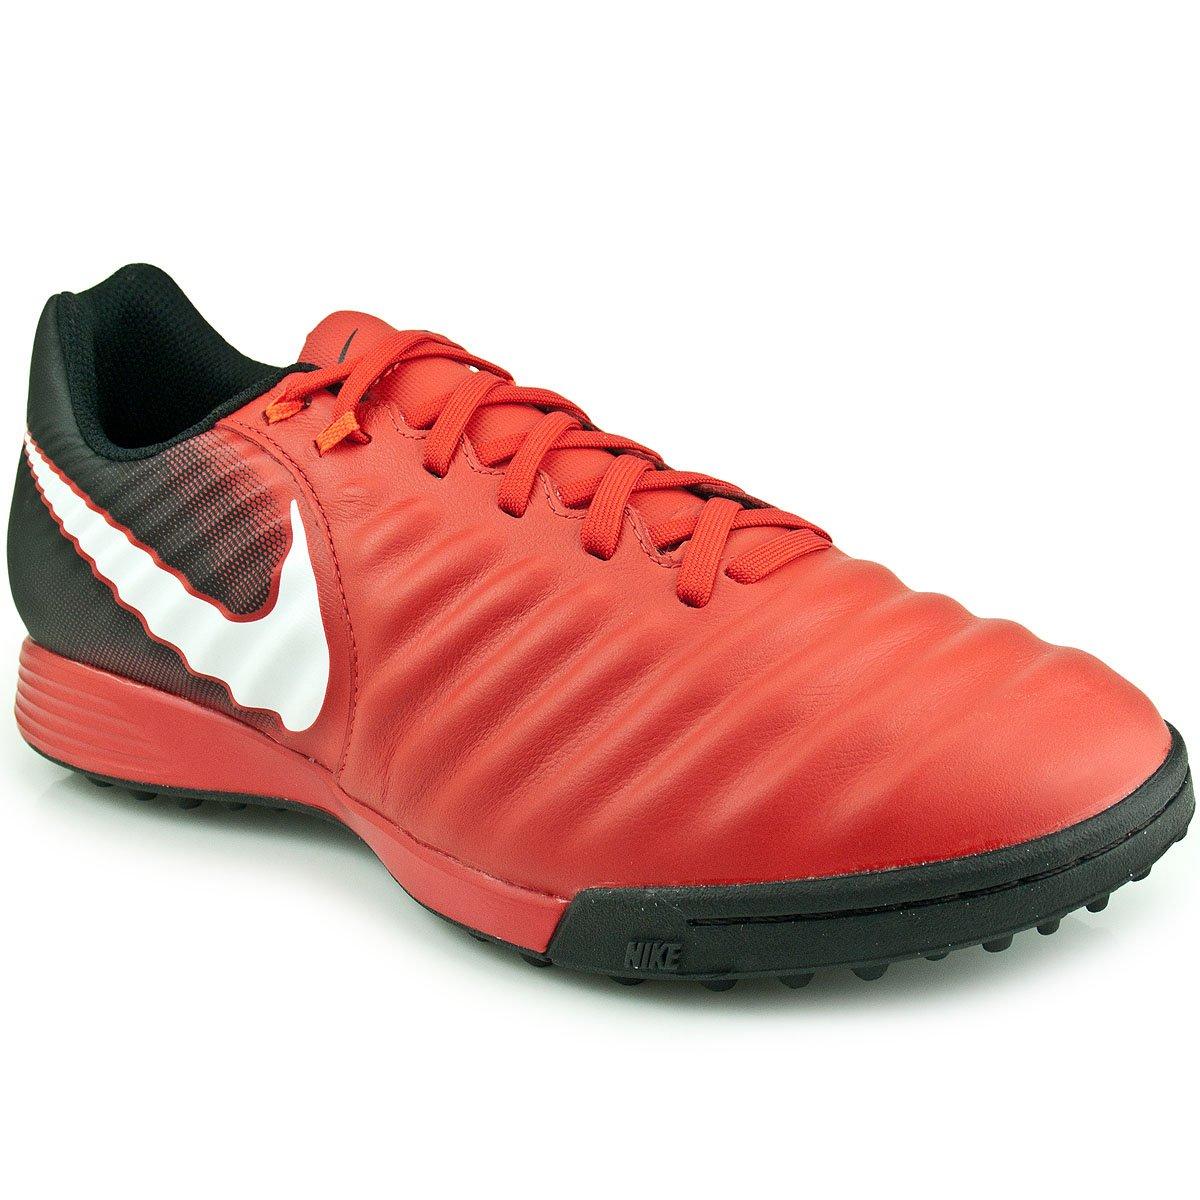 4d5c54378bbc7 Chuteira Nike Tiempo Ligera IV TF